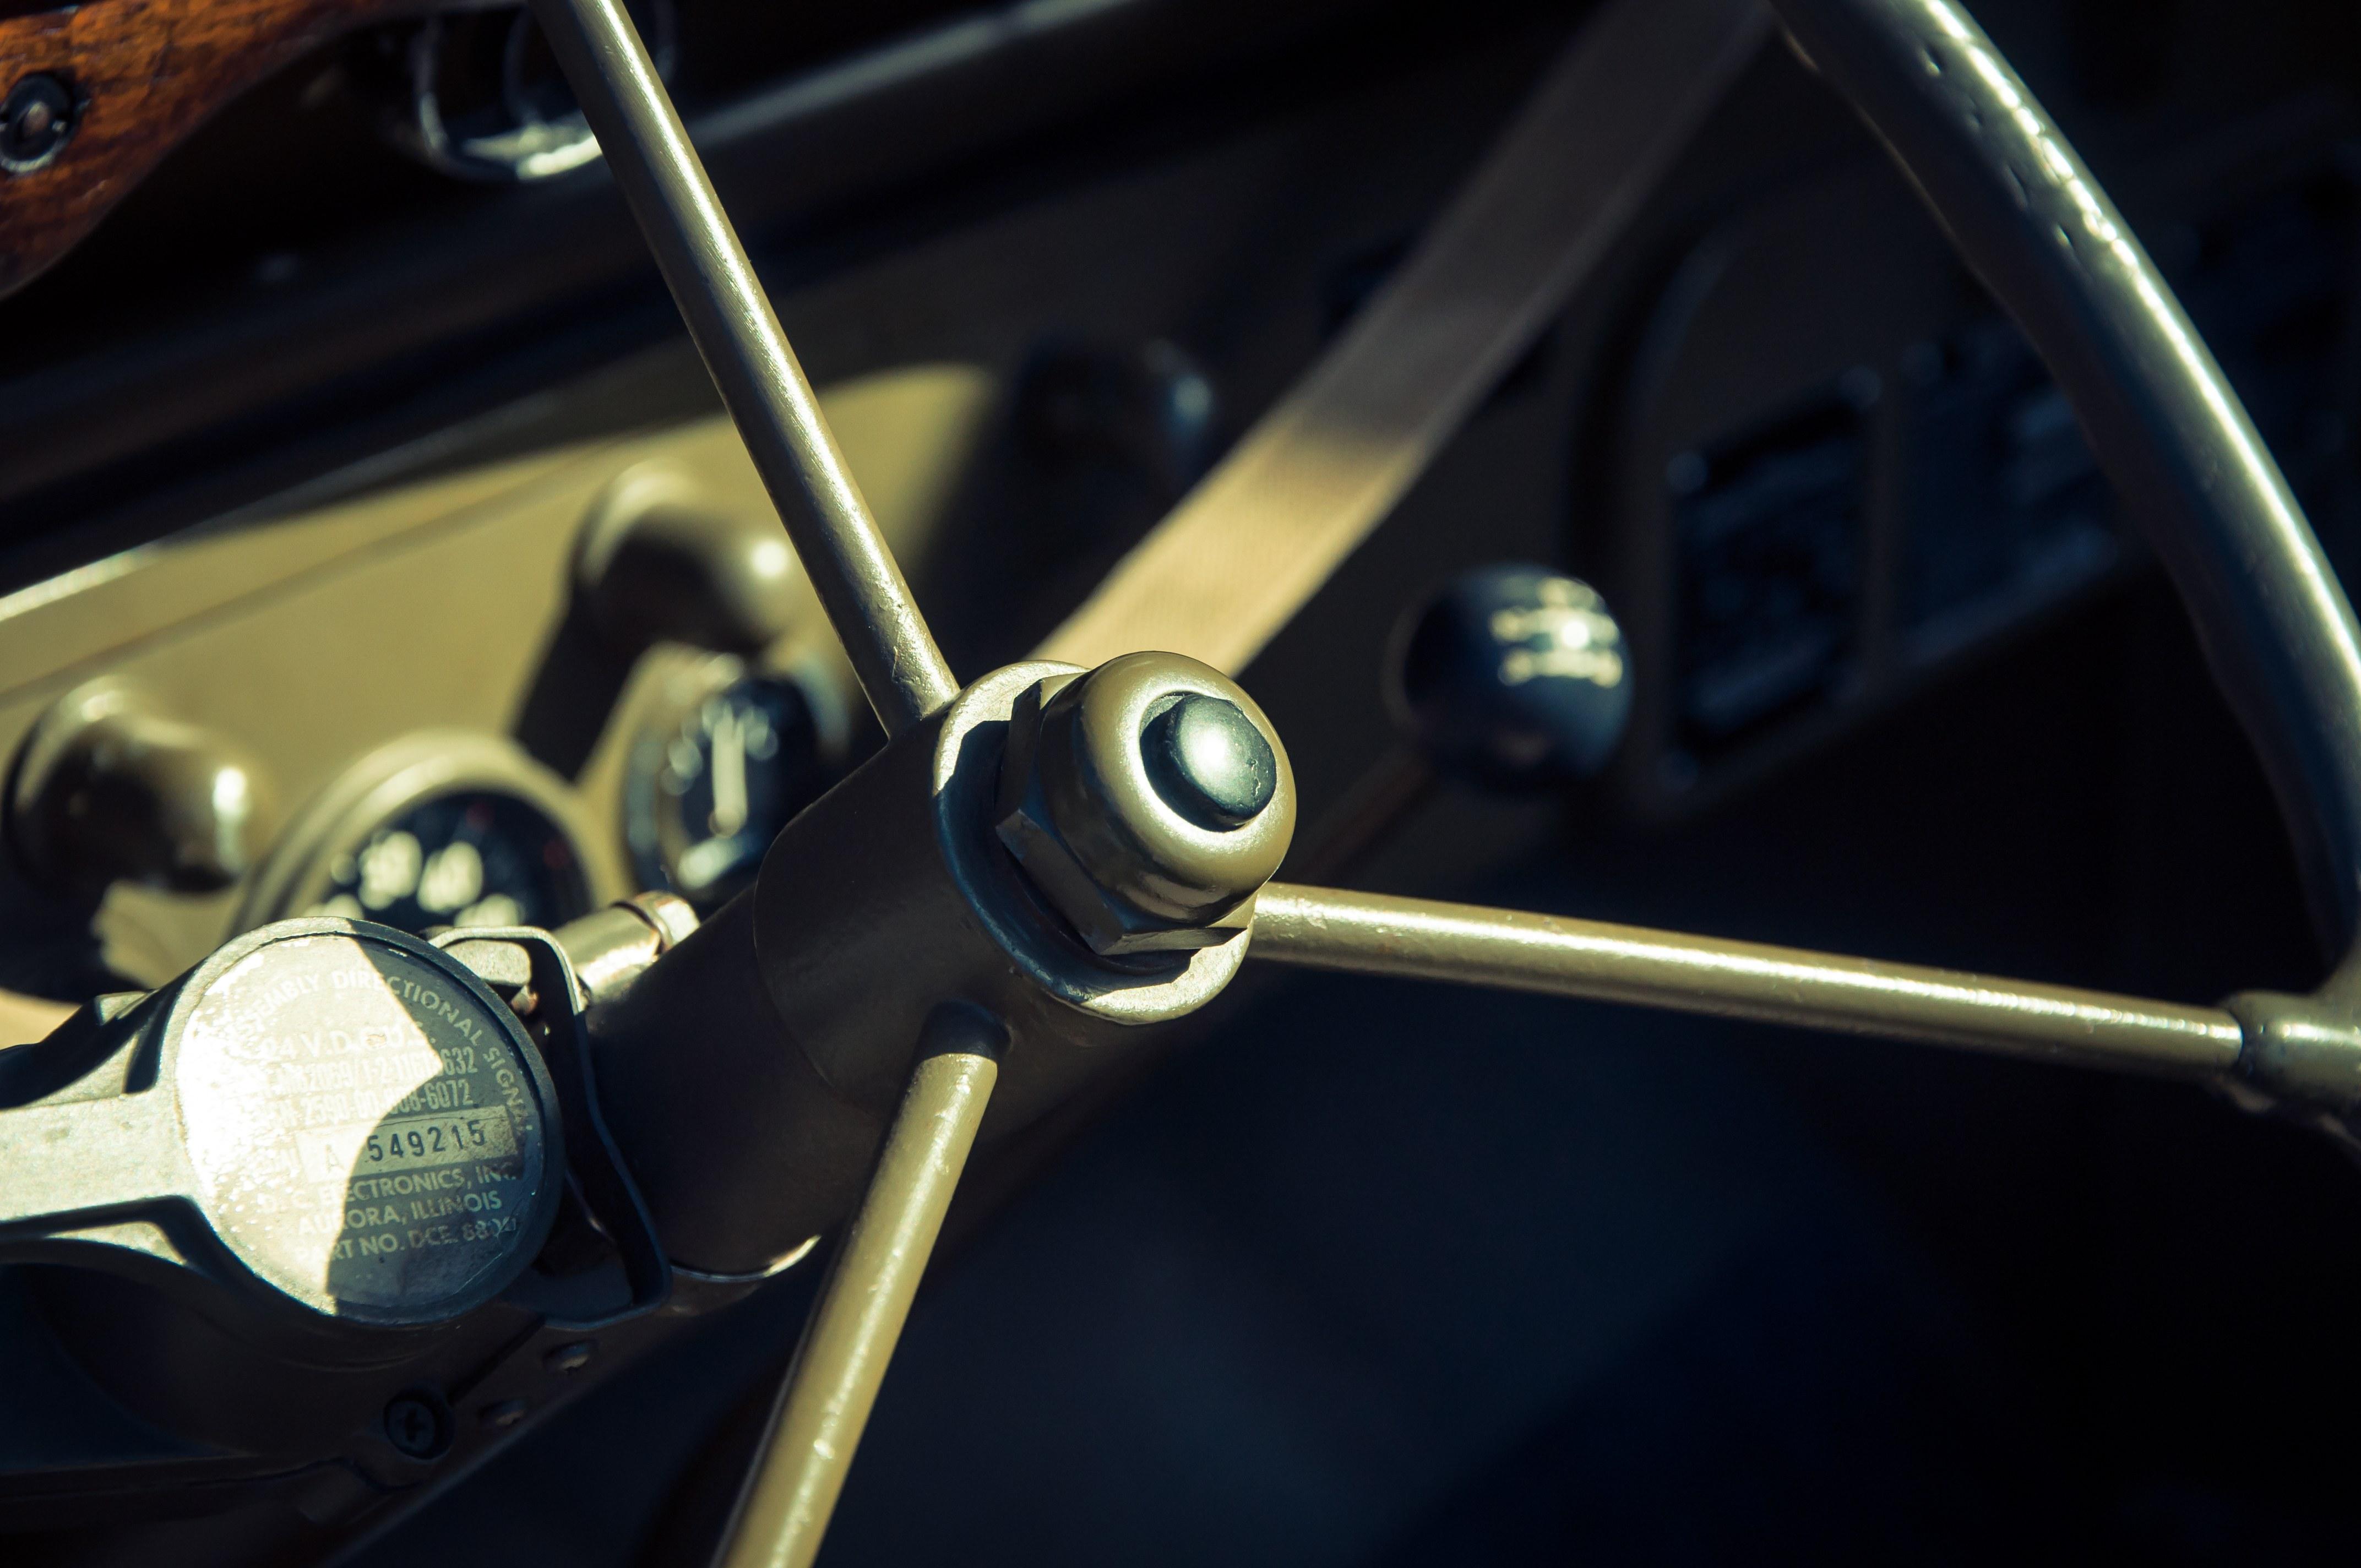 Kostenlose foto : Auto, Rad, Innere, Fenster, Glas, Fahren, alt ...